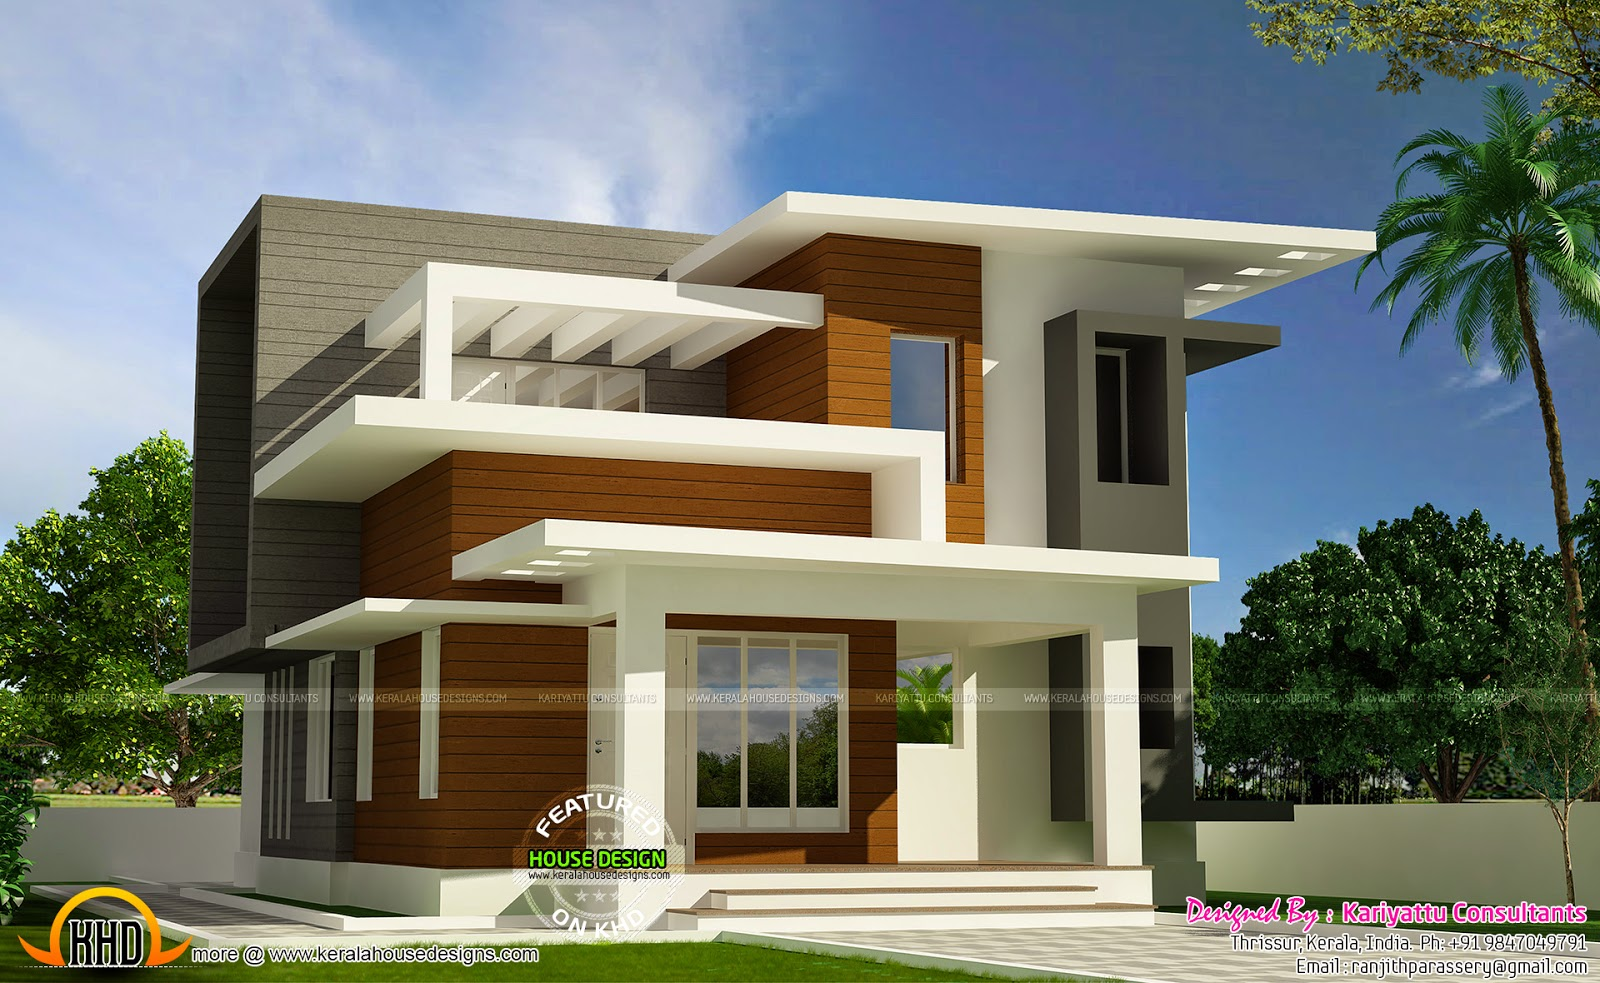 Modern House Design Plans Pdf Modern Double Storey House Plans Pdf - Box type house design philippines